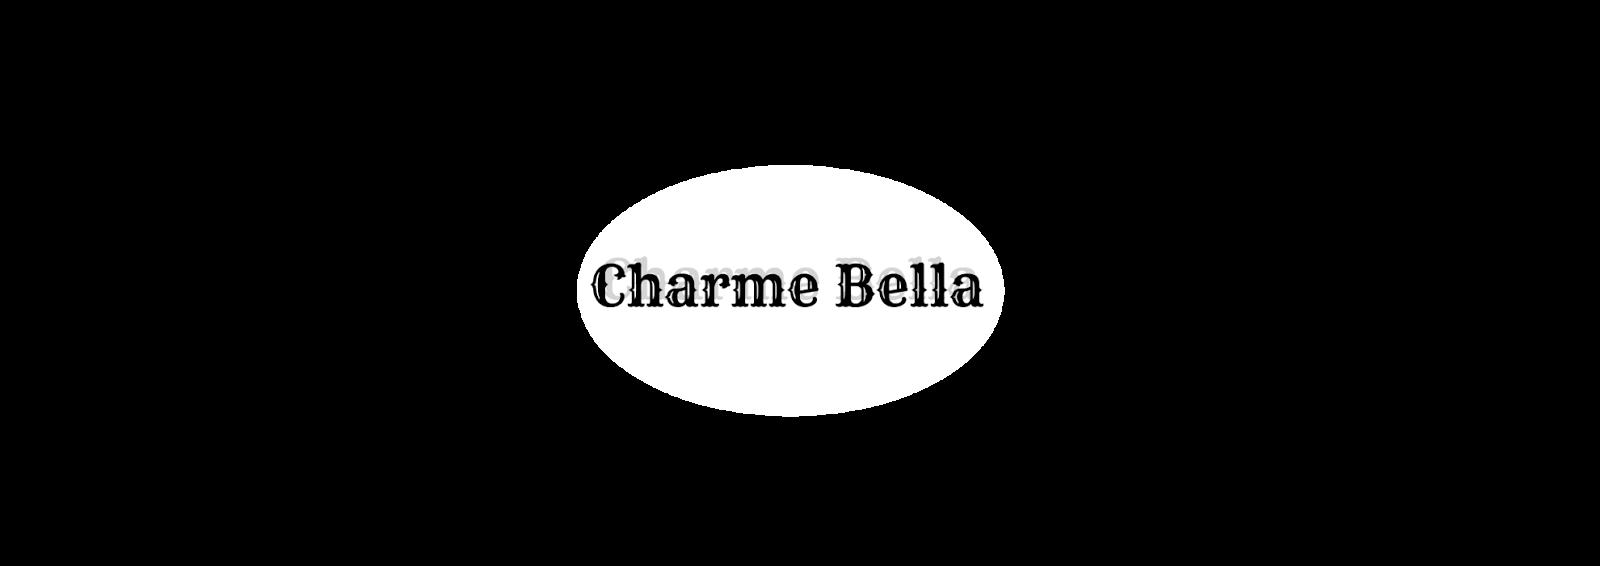 charme bella